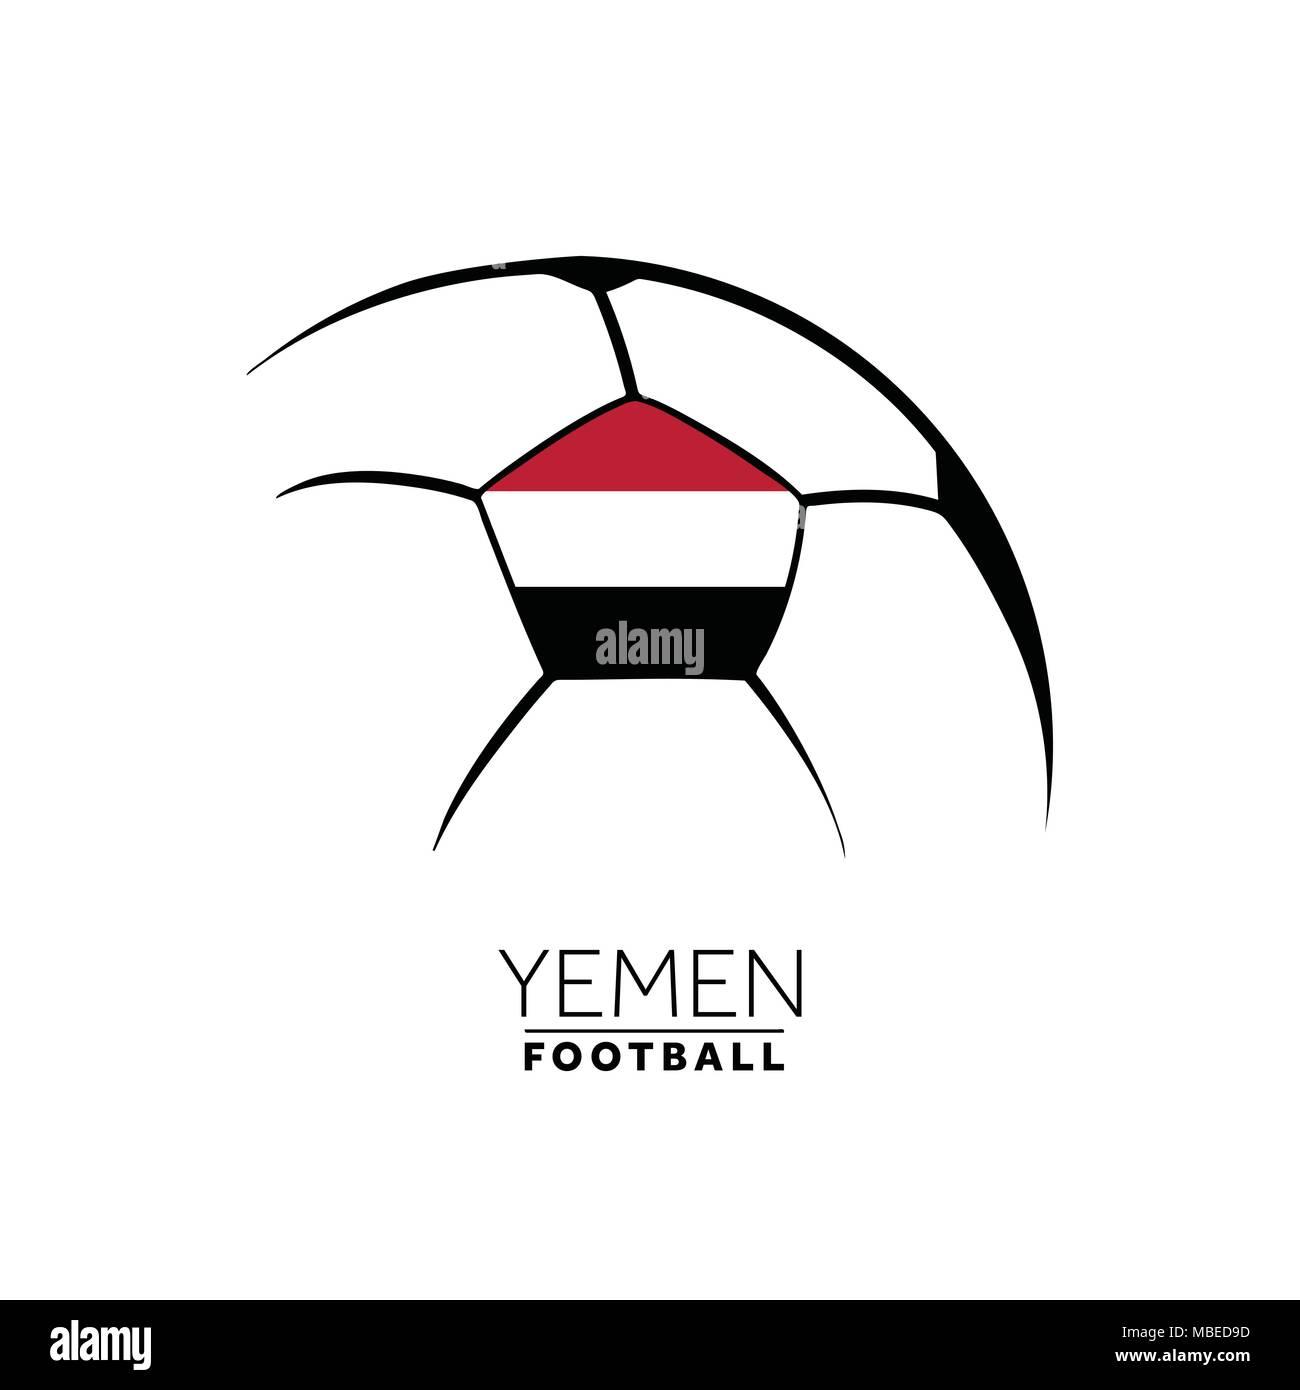 Soccer football minimal design with Yemen flag - Stock Image